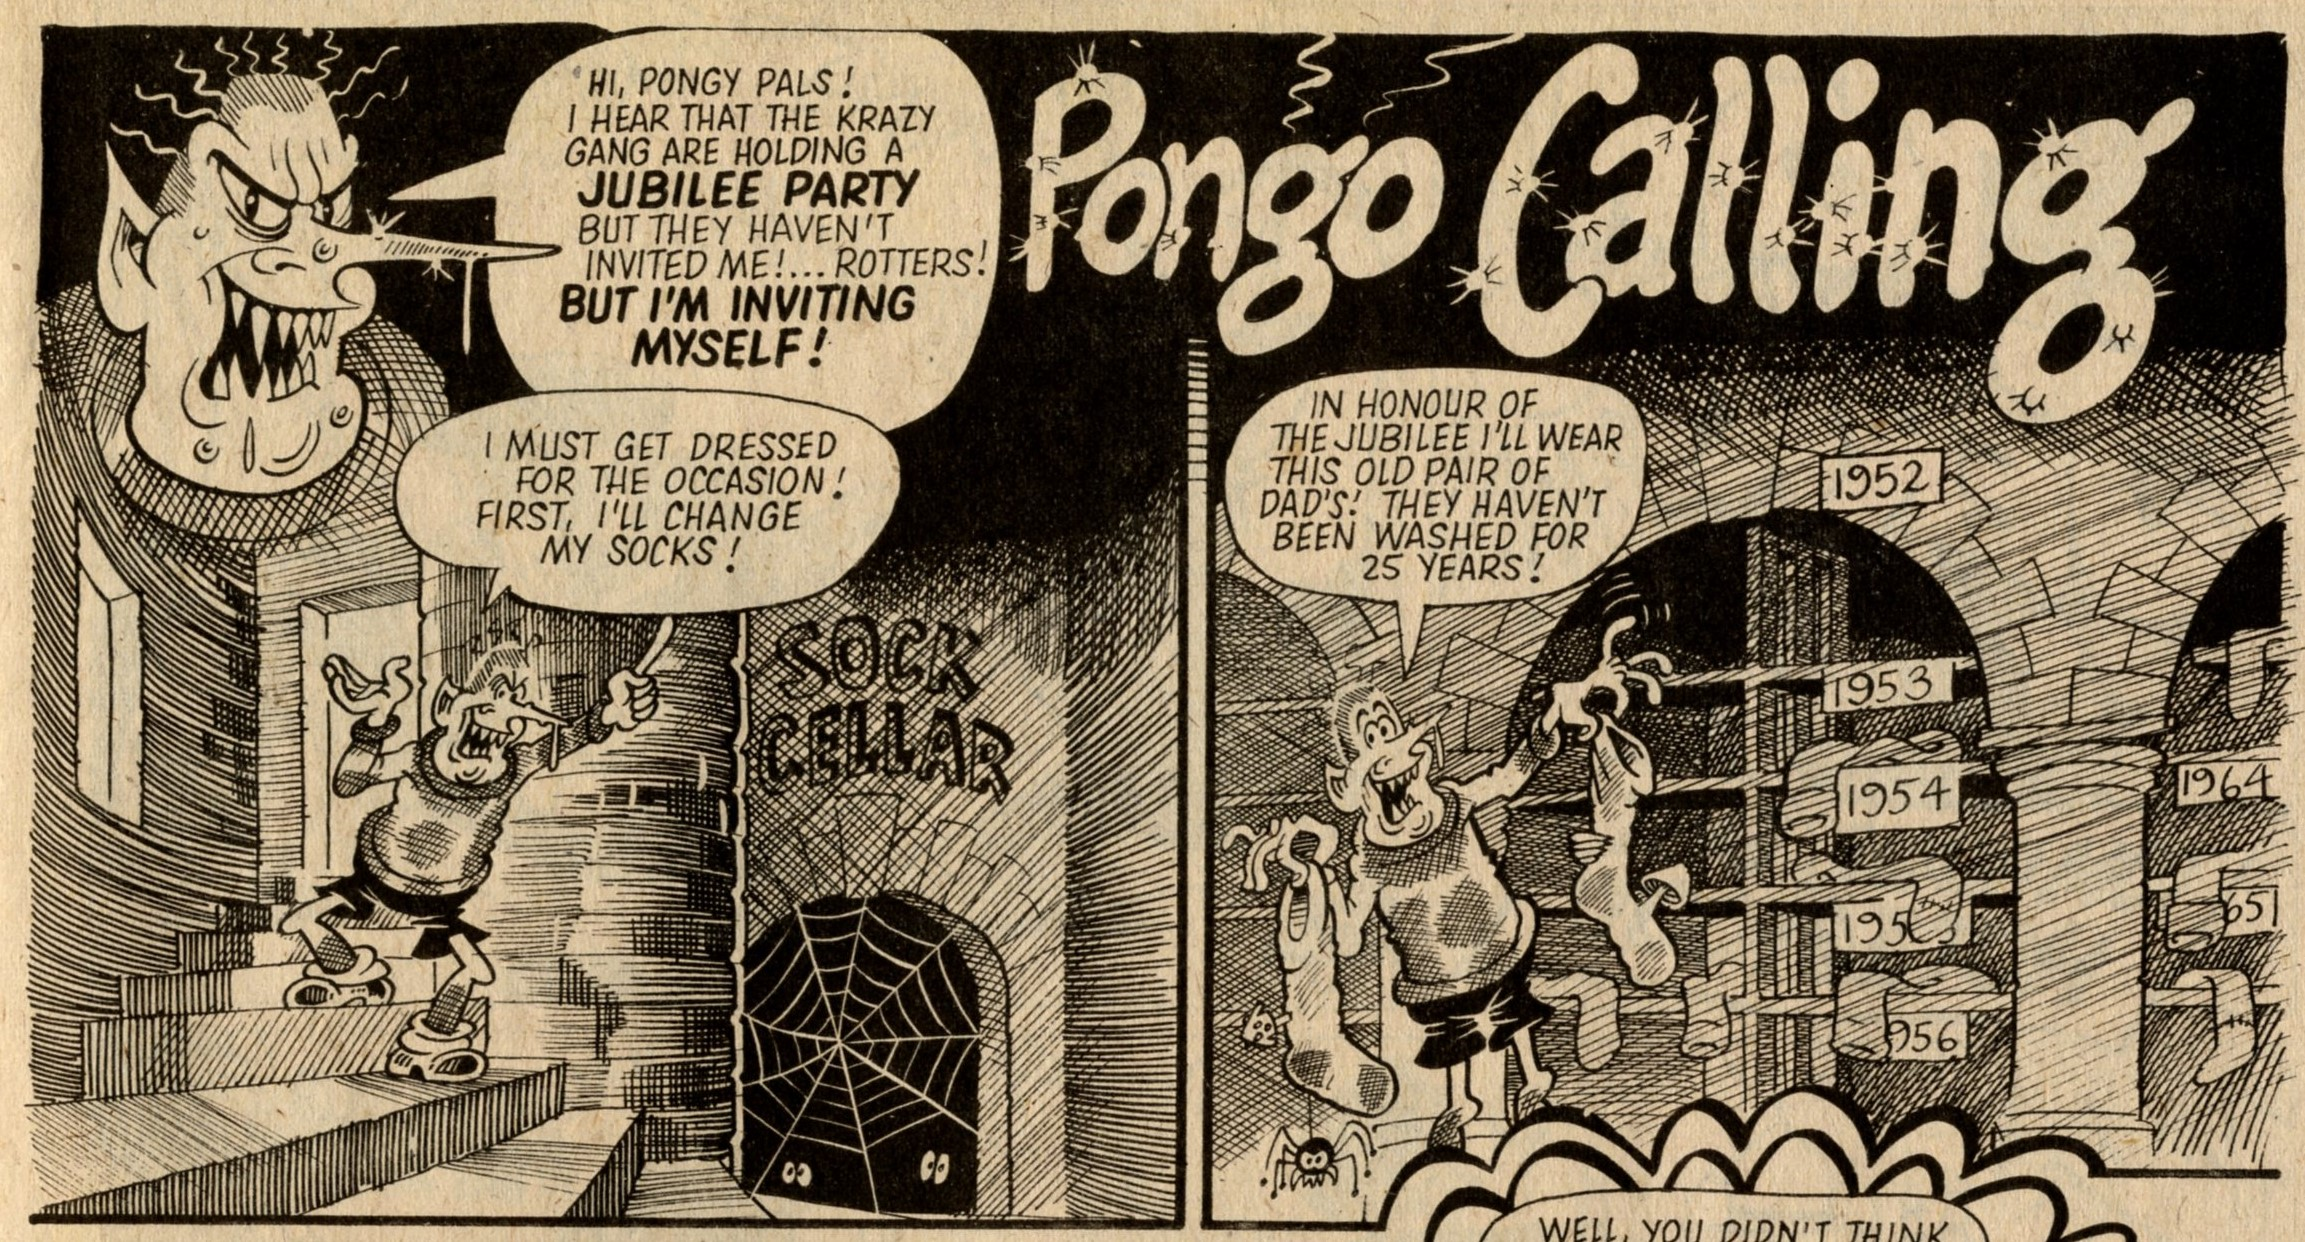 Pongo calling: Ian Knox (artist)